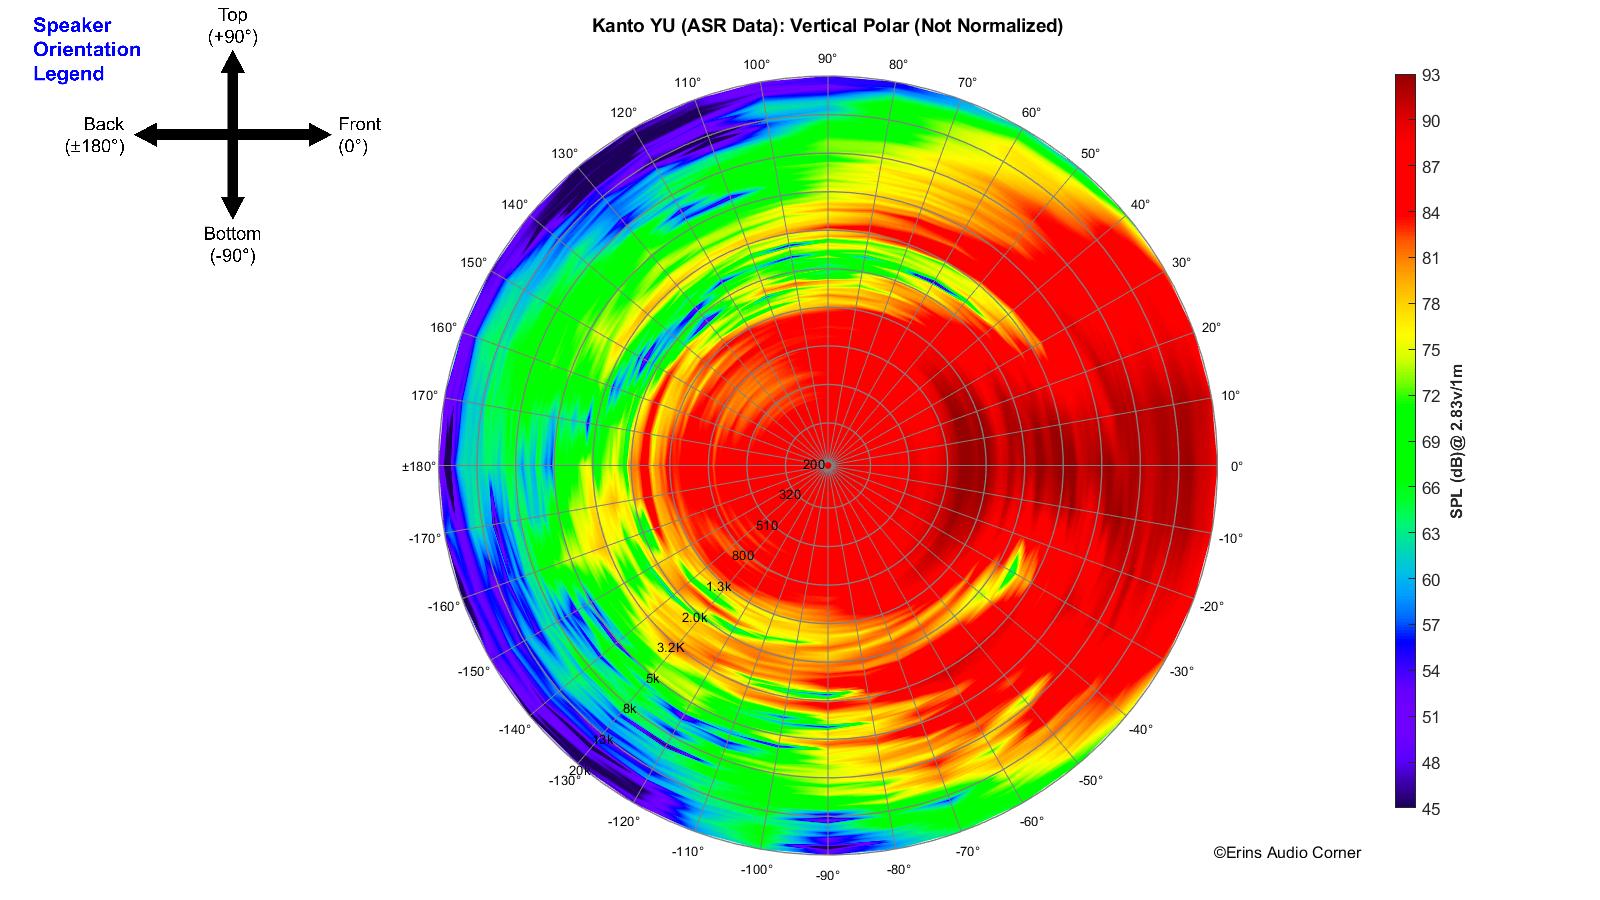 Kanto YU (ASR Data)_360_Vertical_Polar.png